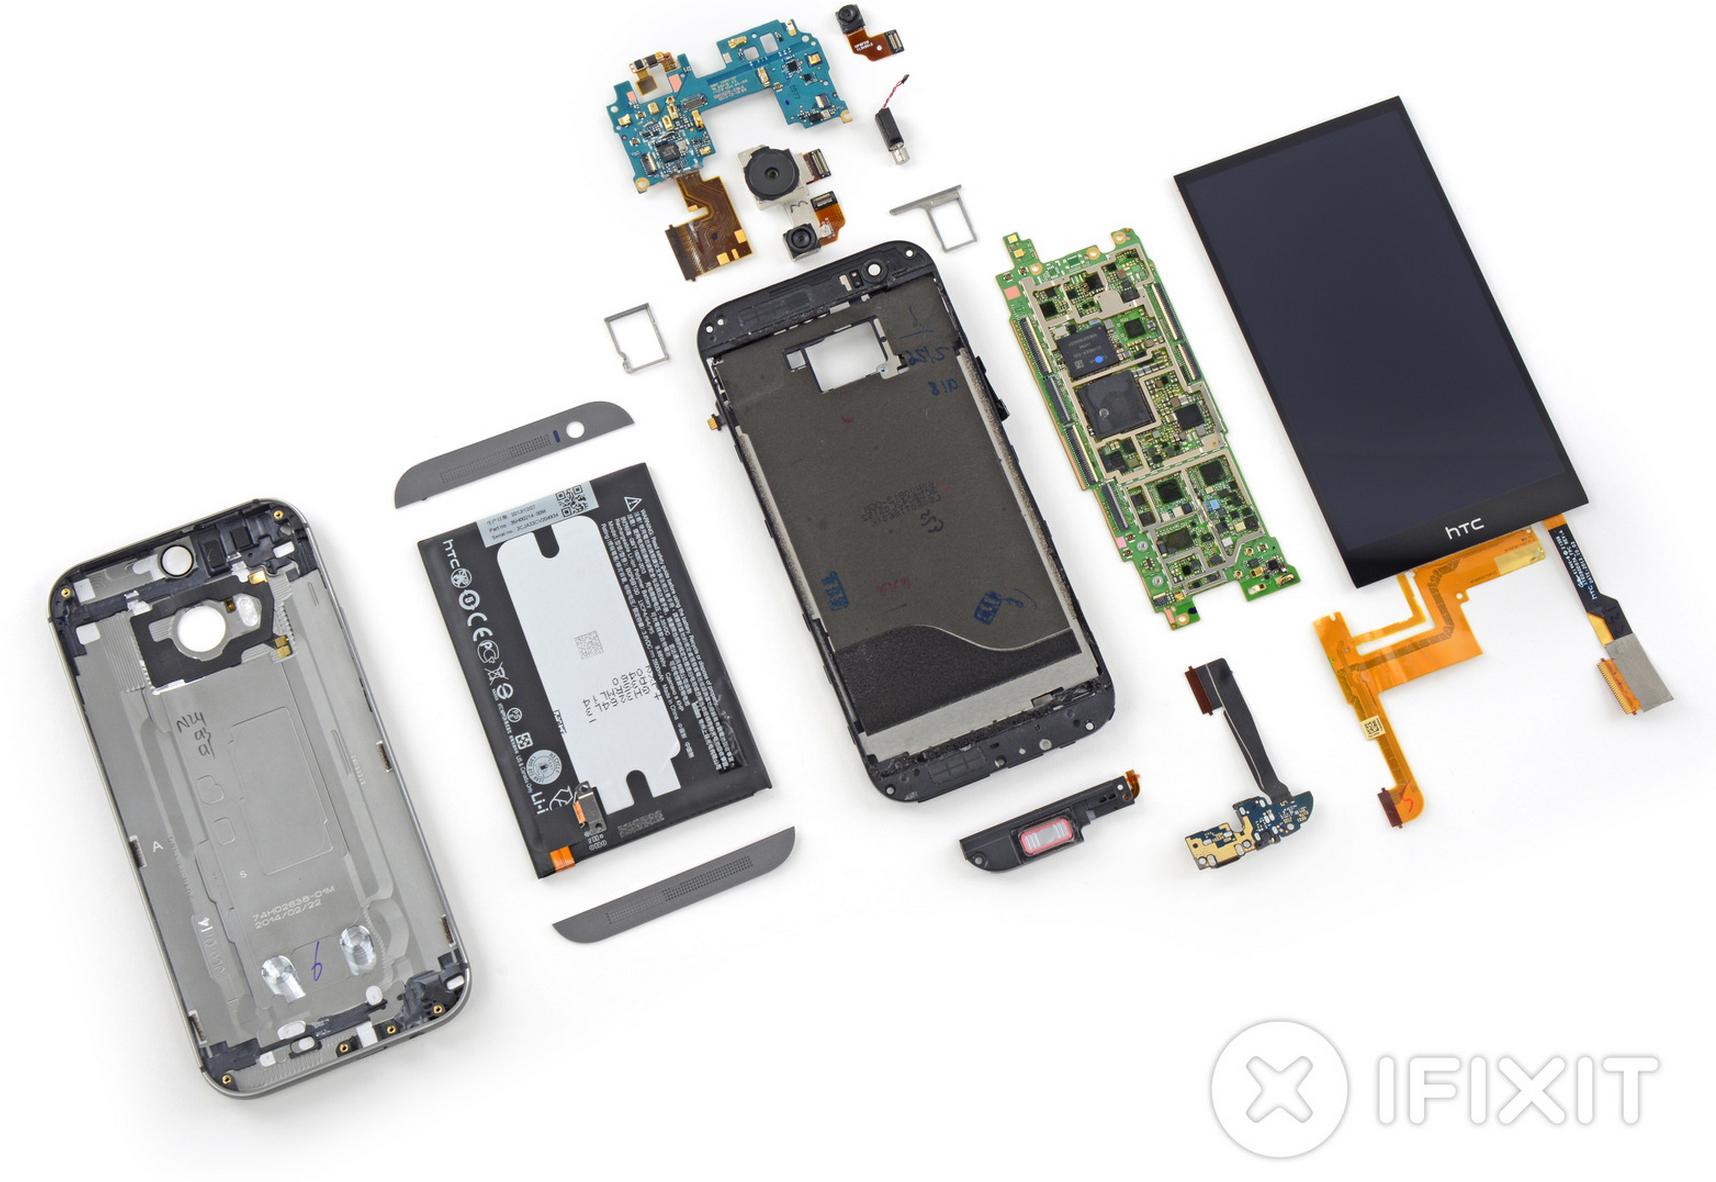 HTC-One-teardown